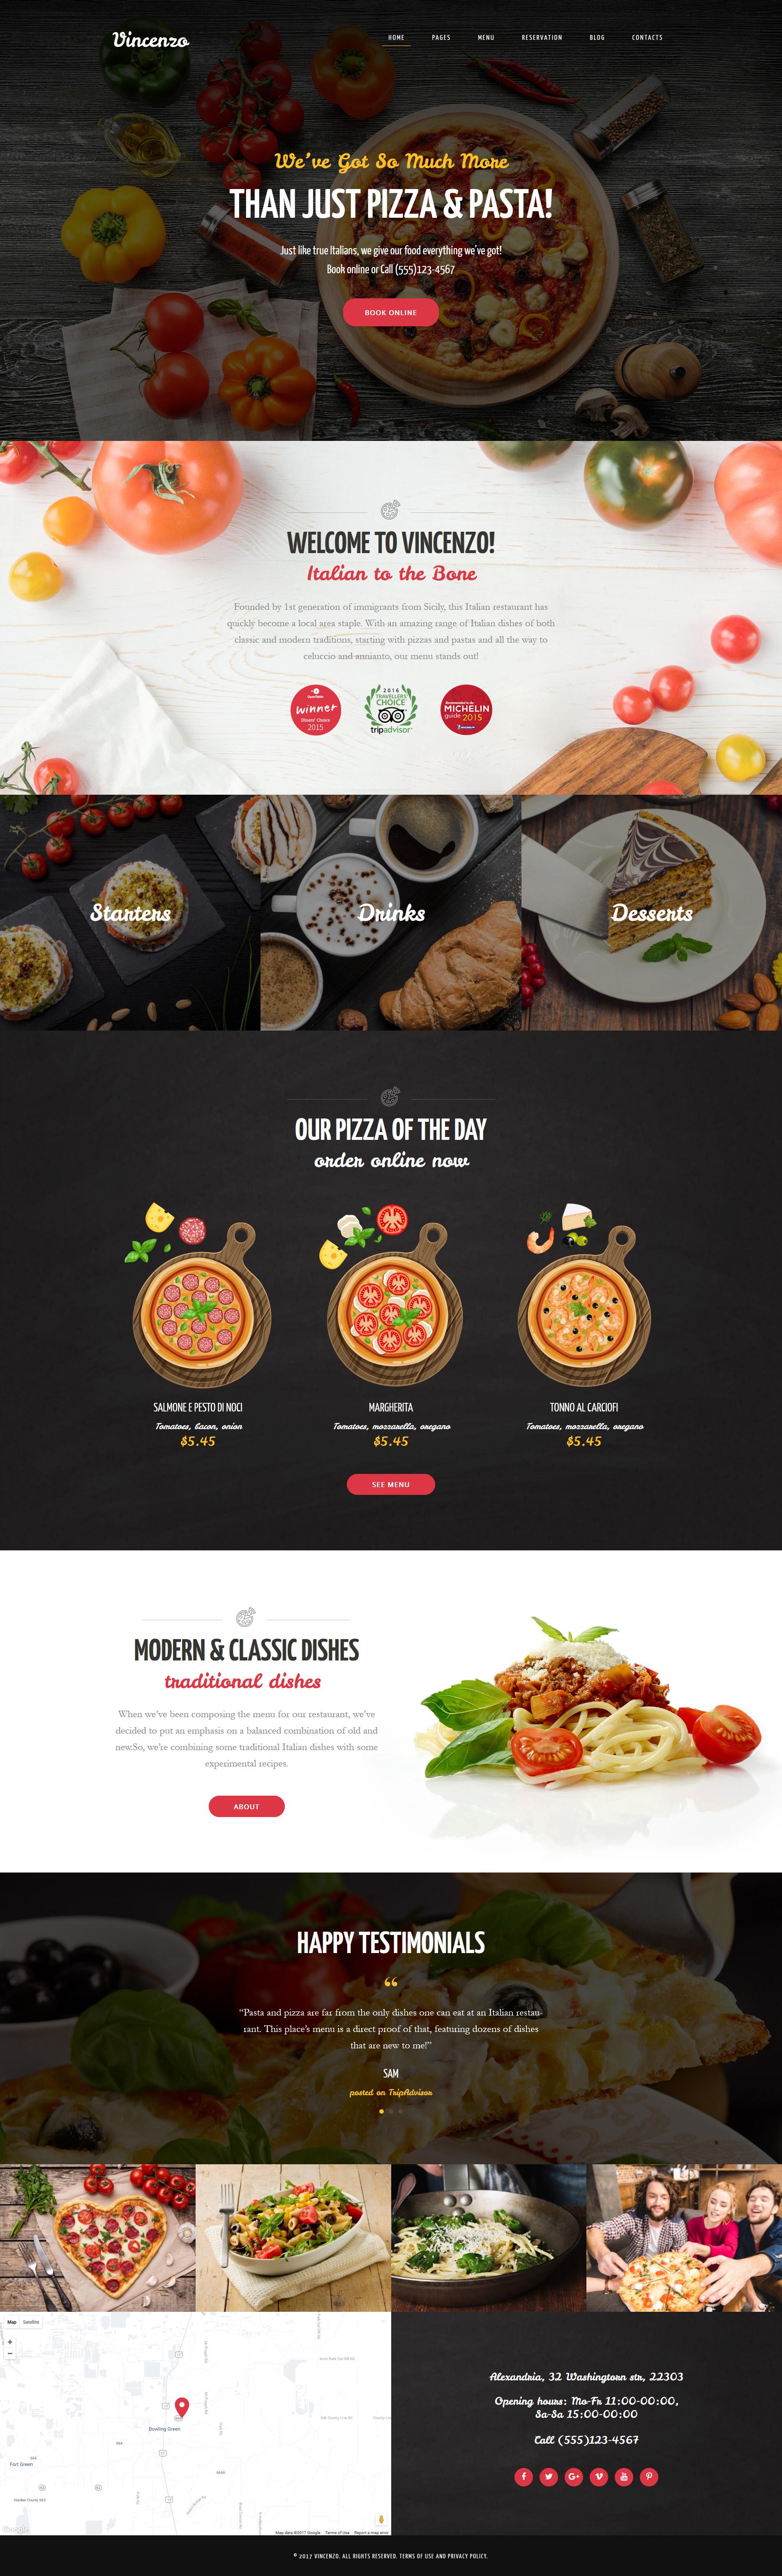 Vincenzo - Delicious Pizza Restaurant Responsive Tema WordPress №63633